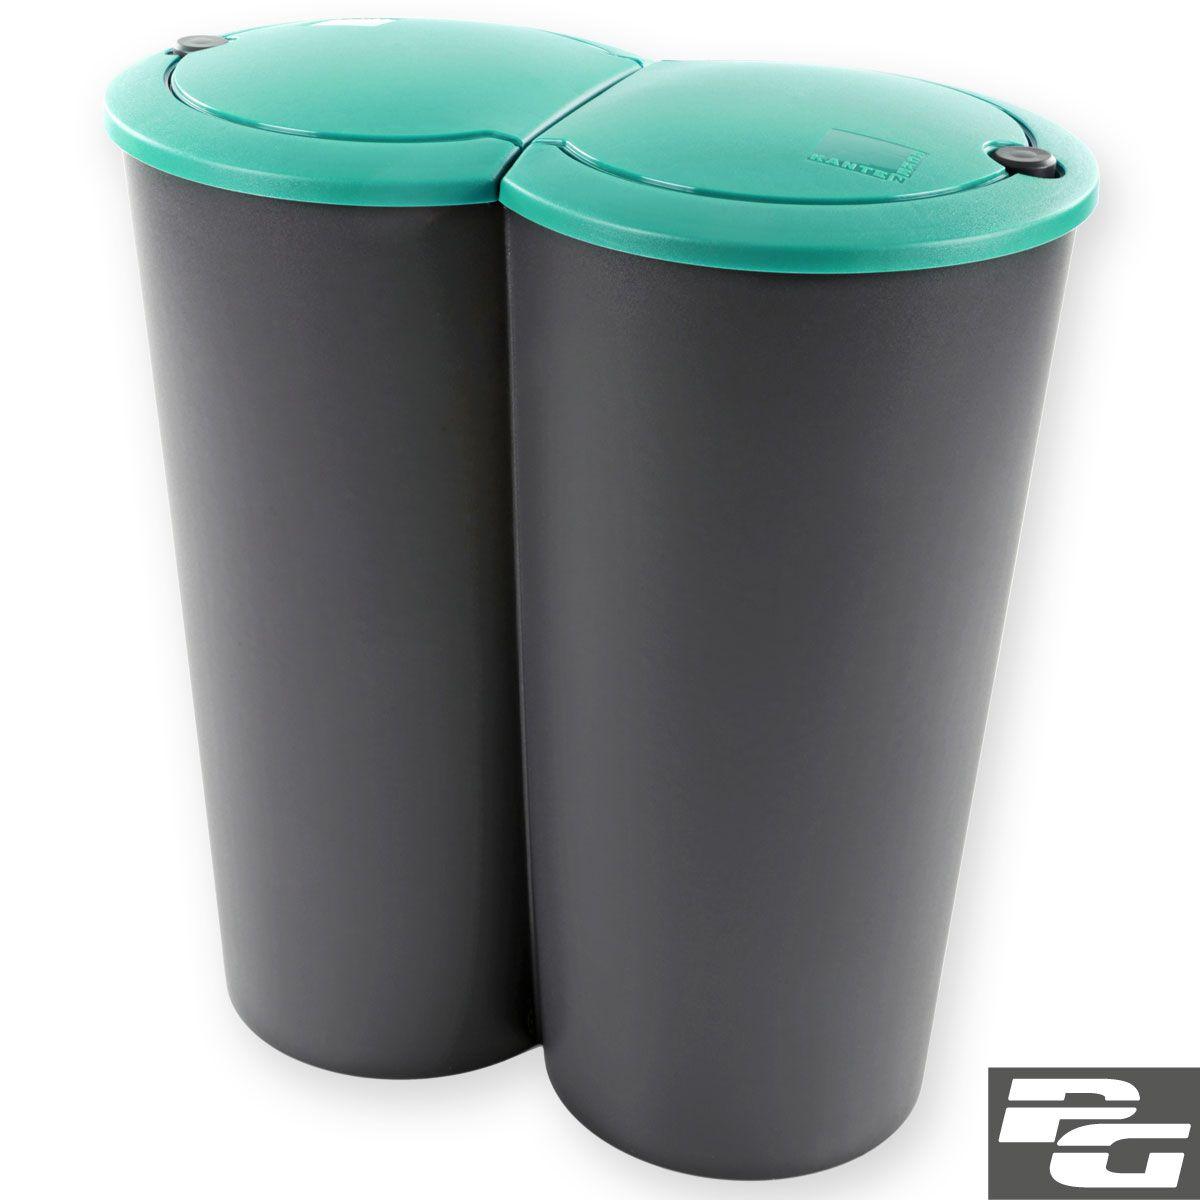 Mulleimer 2x25l 50l Duo Bin Kunststoff Mulltrenner Abfalleimer Treteimer Abfalleimer Kunststoff Abfall